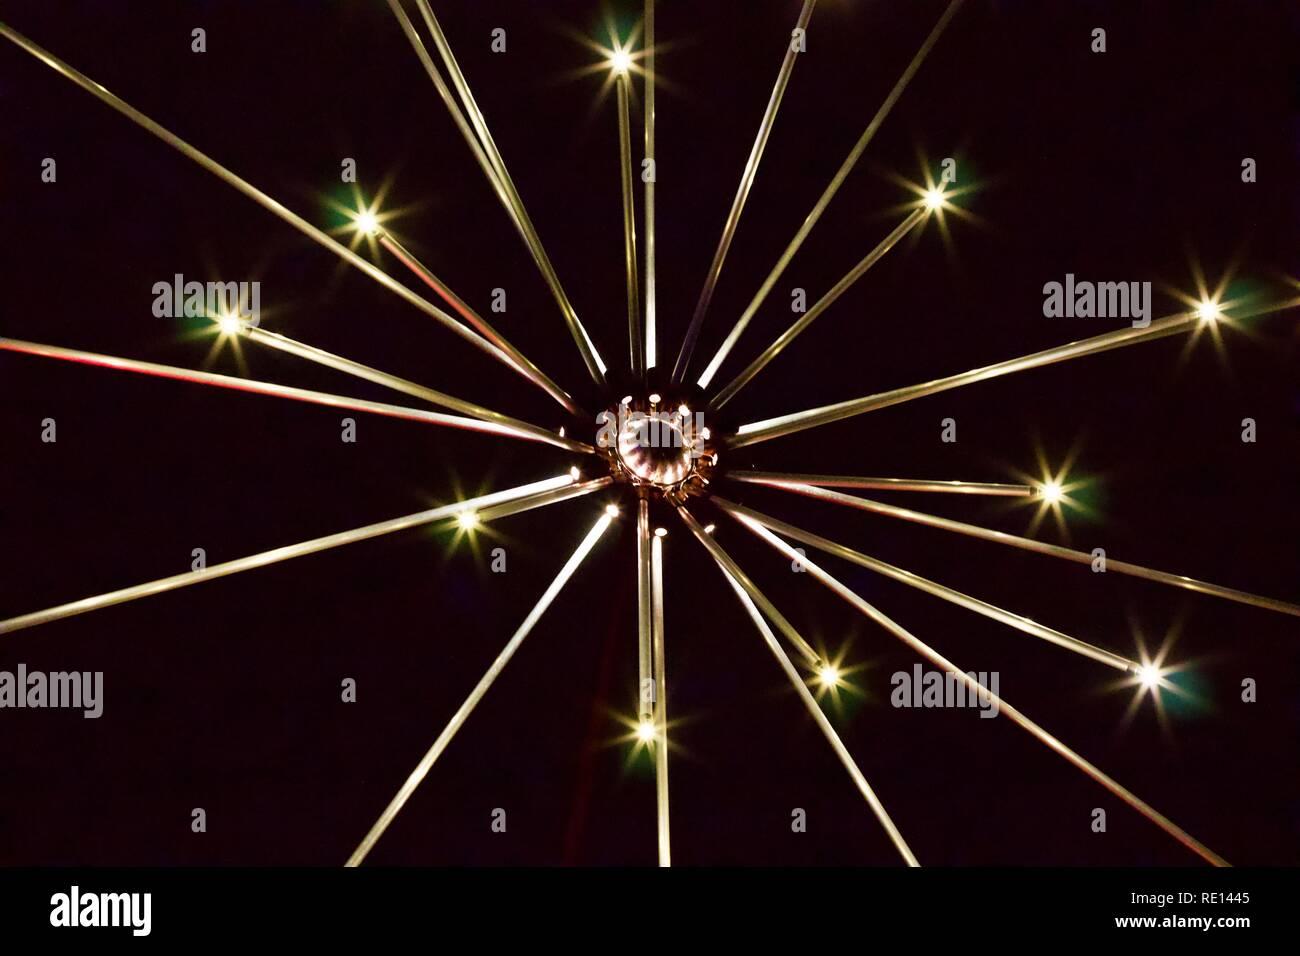 Closeup of a snowflake sculpture made of sparkling lights at Christmas at Kew Gardens 2018 - Stock Image